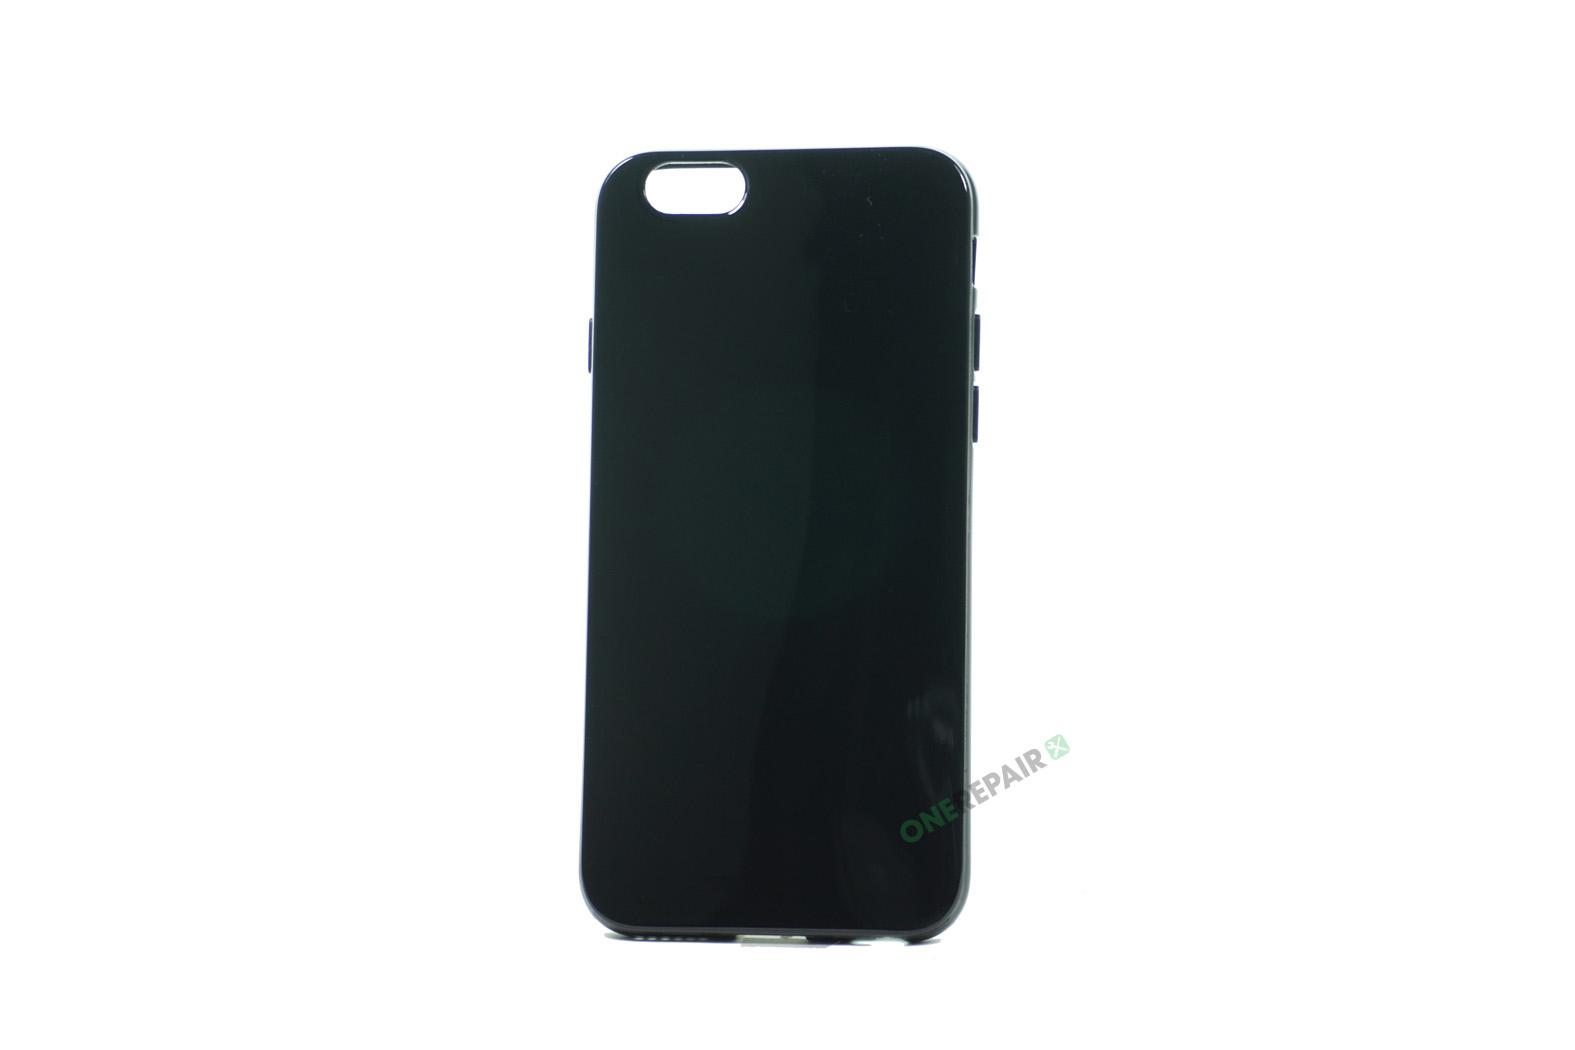 iPhone 6, 6S, A1549, A1586, A1589, A1633, A1688, A1700, A1691, Apple, Bagcover, Cover, Sort, Billig